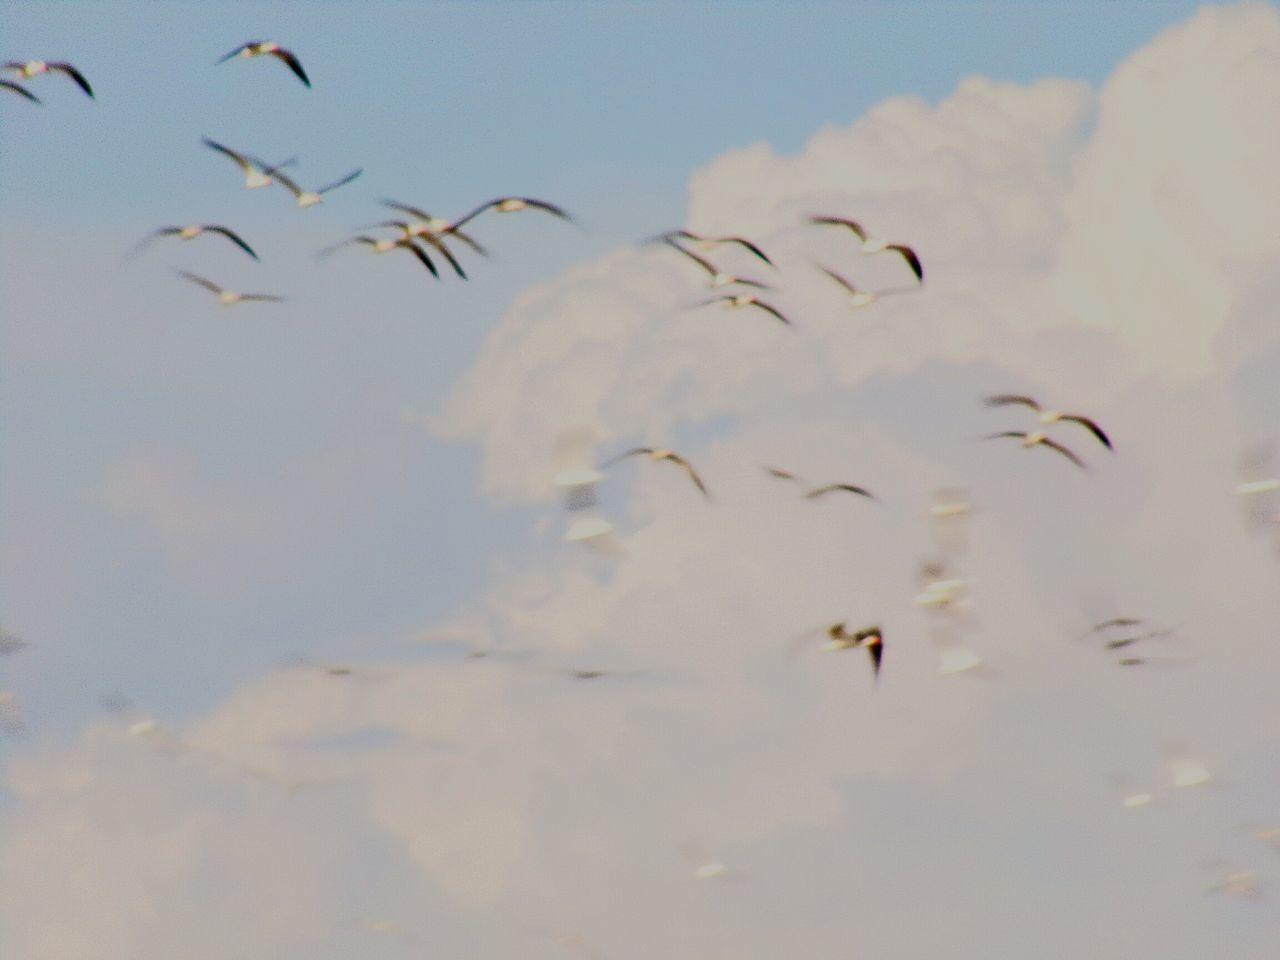 Cloud's&Bird's Flying Flock Of Birds Animals In The Wild Animal Wildlife Sky Spread Wings Outdoors Eyeemnaturelover Full Frame EyeEmBestShot's Loverofnature Peaceful And Serene Birds Of EyeEm